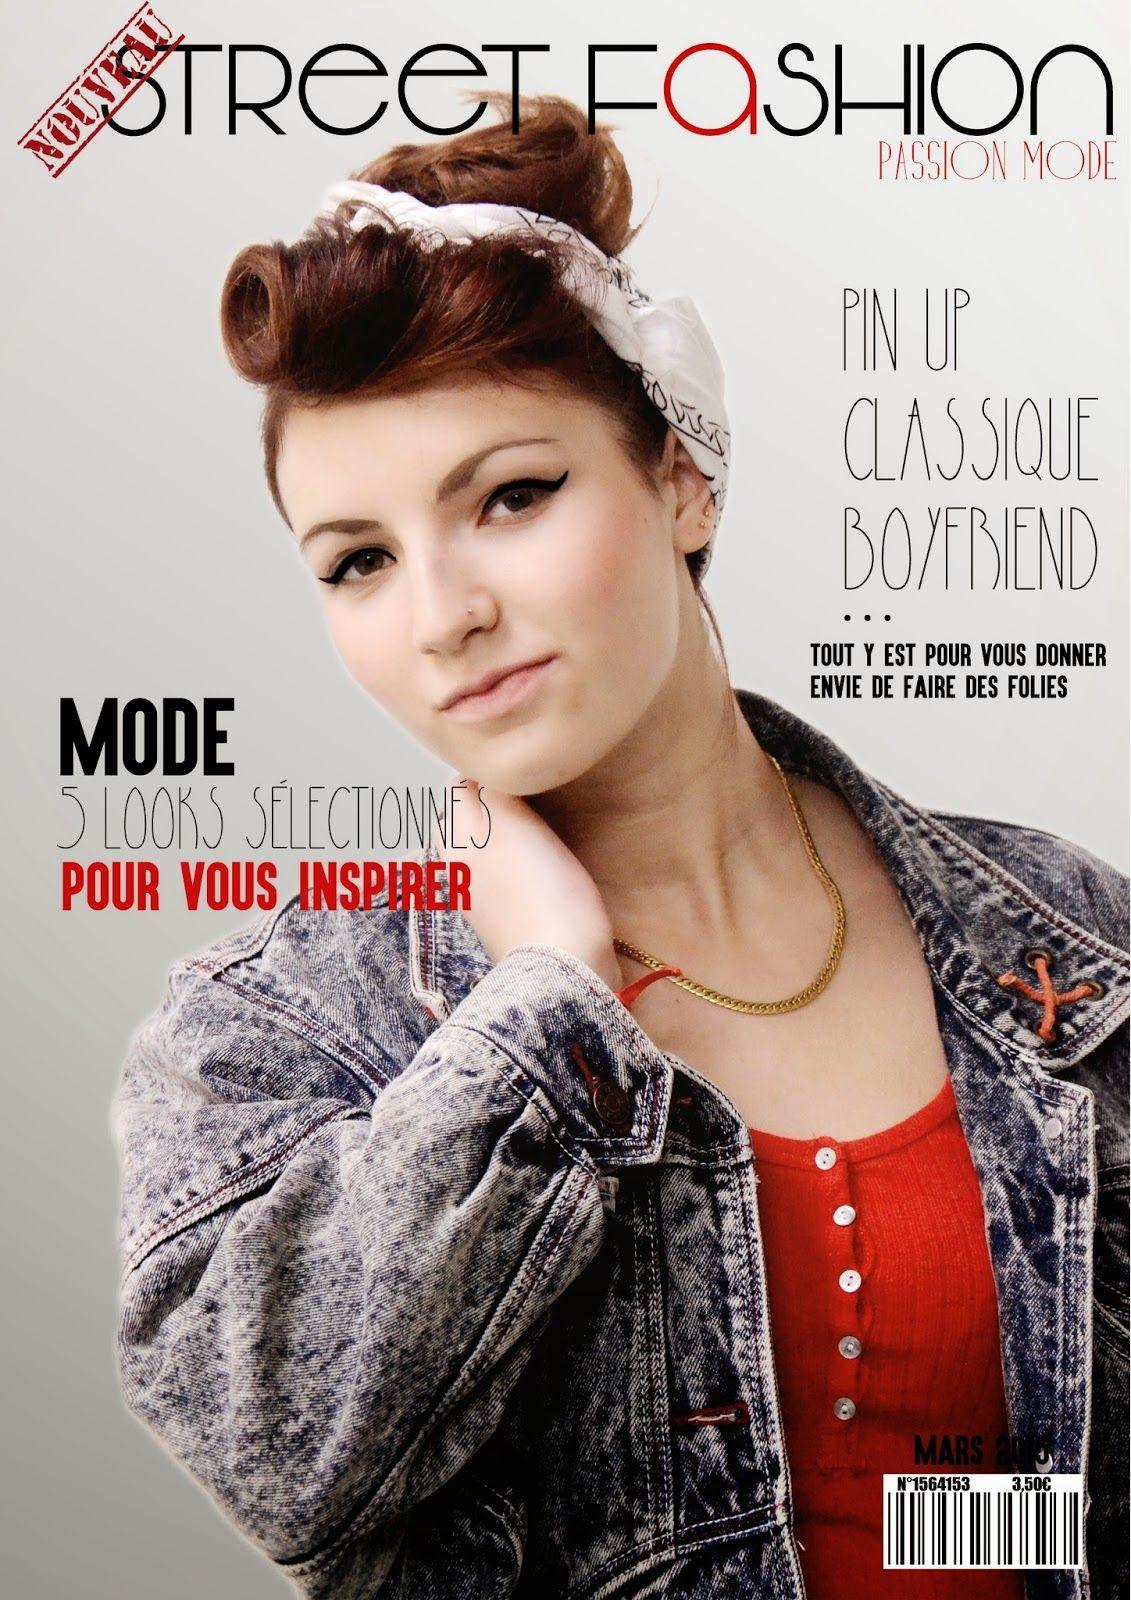 Eouzan.H: Street Fashion - Le Magazine